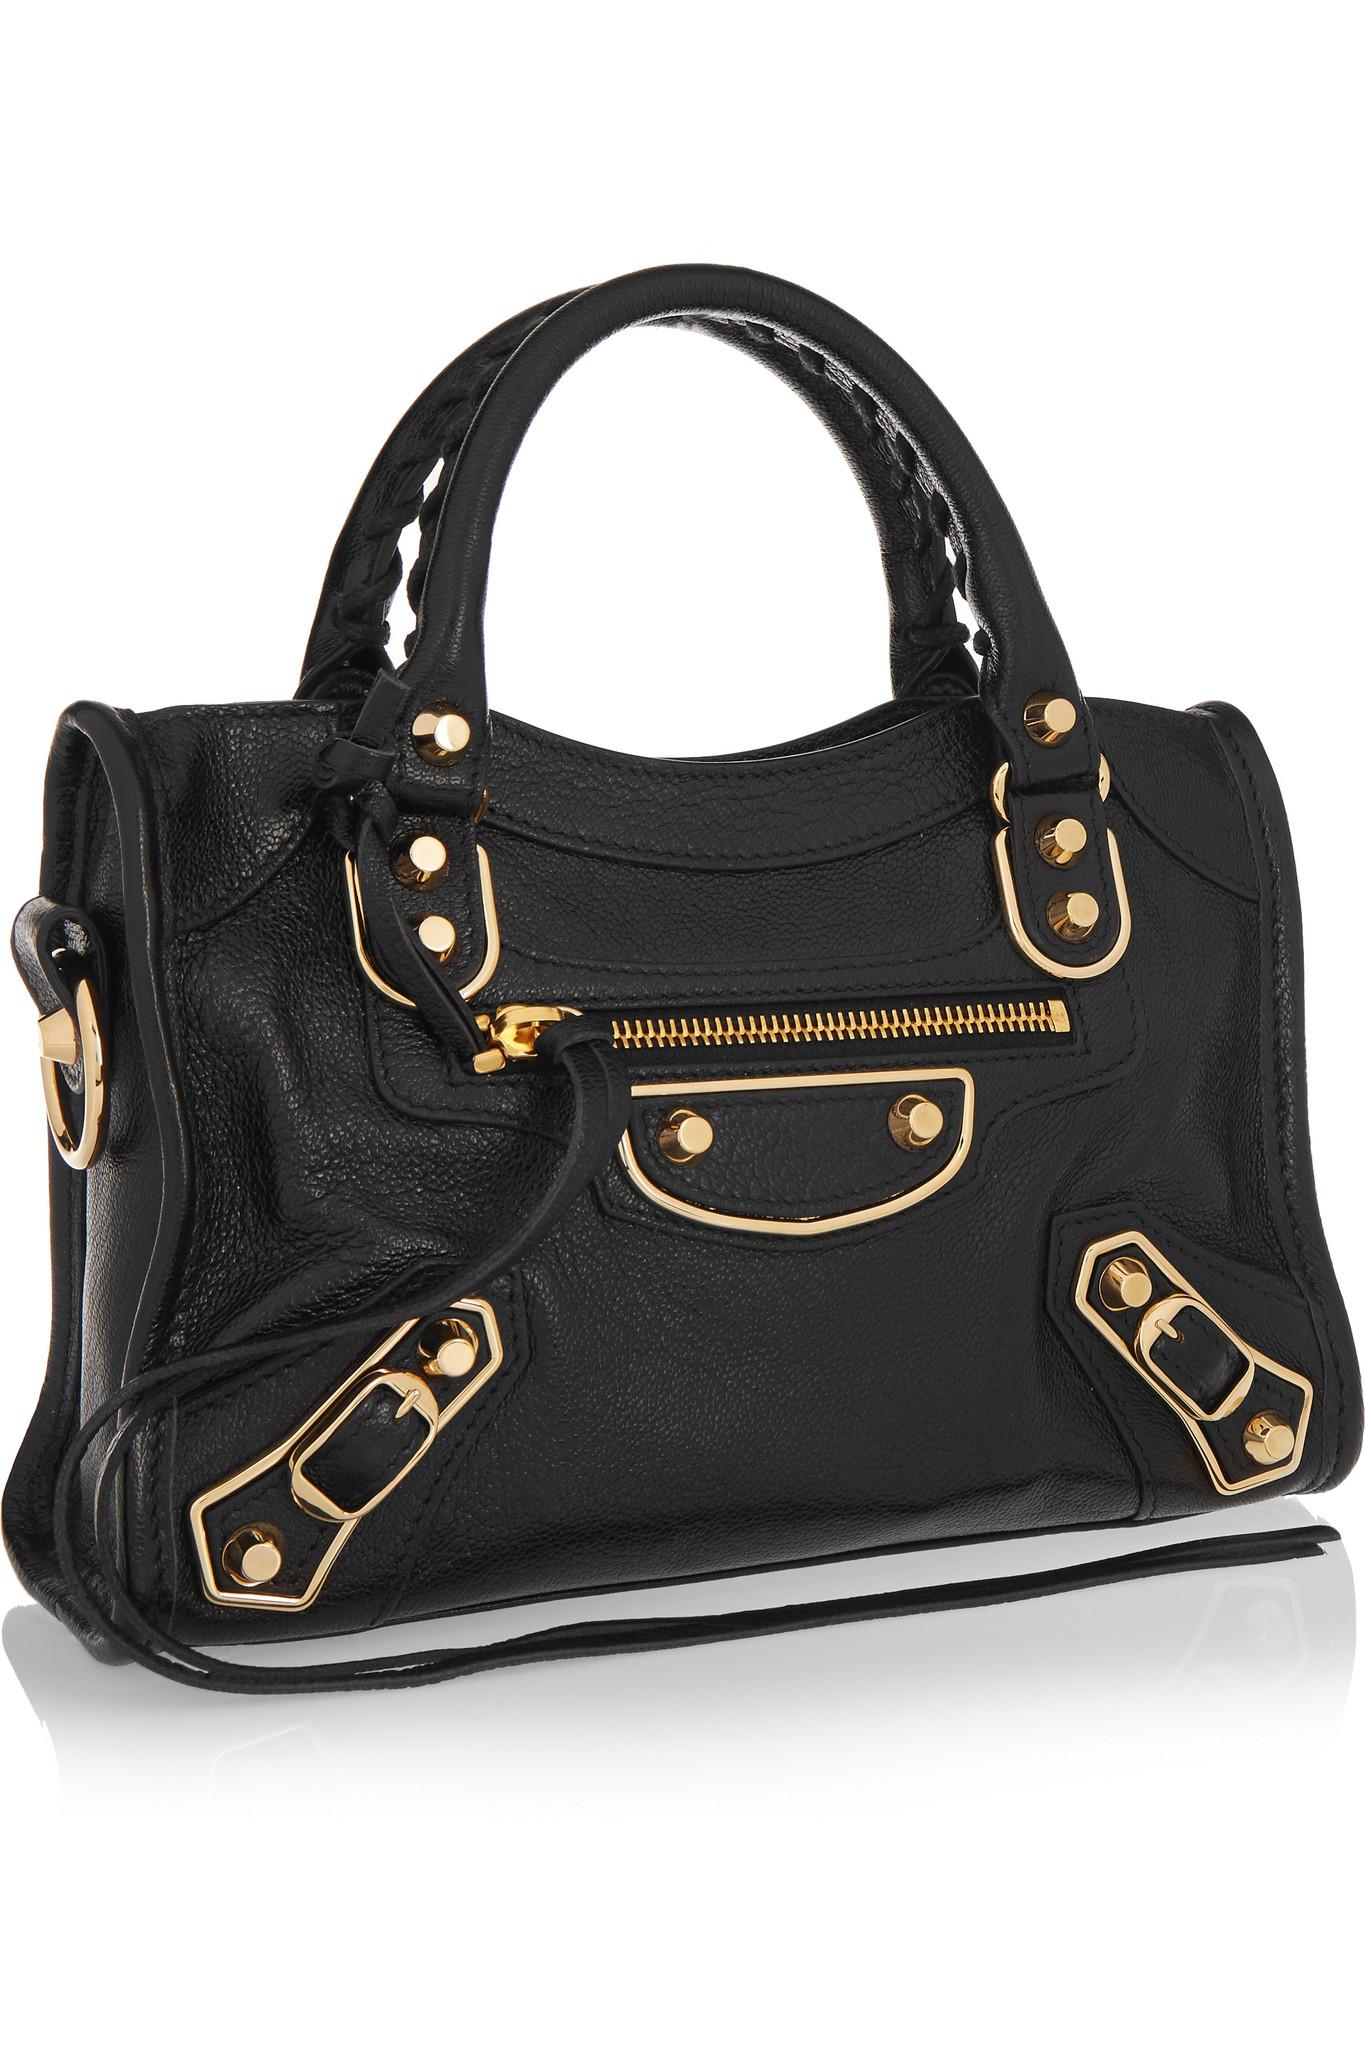 balenciaga classic metallic edge city mini textured leather shoulder bag in black lyst. Black Bedroom Furniture Sets. Home Design Ideas